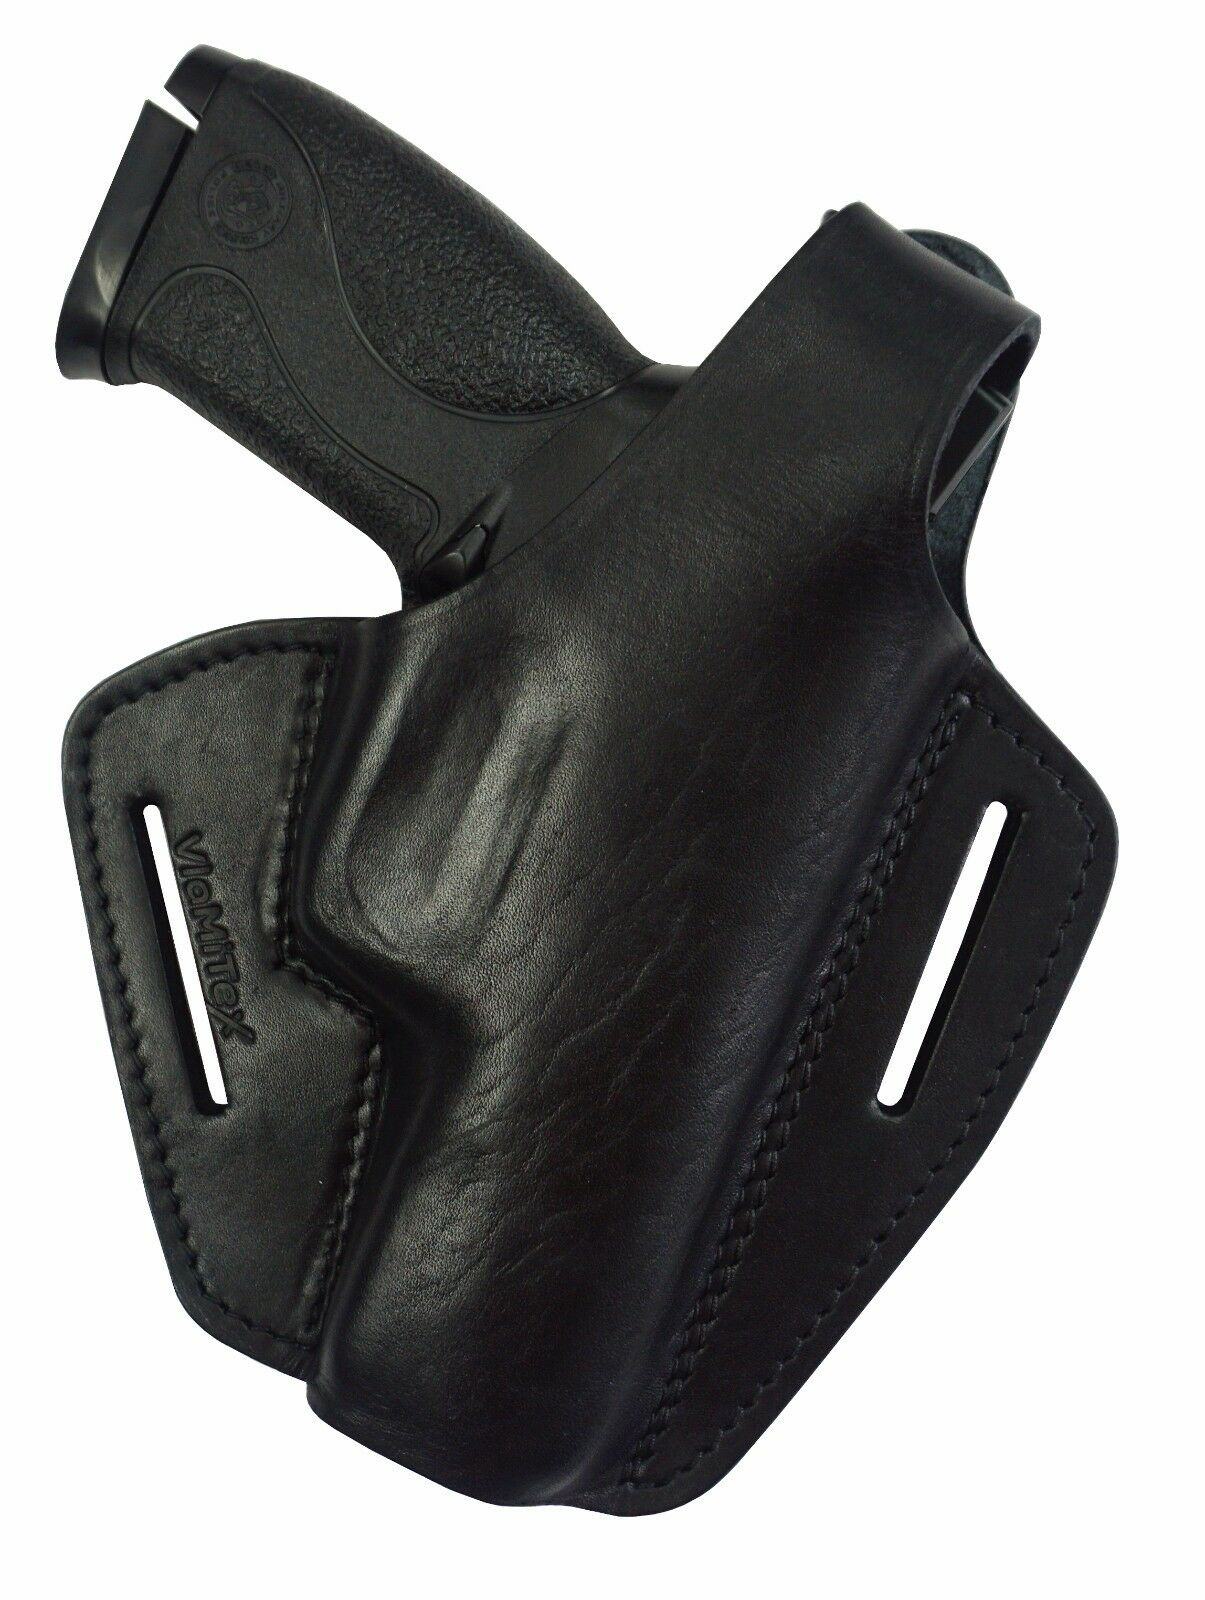 B2 Leder Pistolenholster Pistolenholster Pistolenholster Holster für Smith&Wesson MP9 MP9L Pro Series MP40 NEU 077611